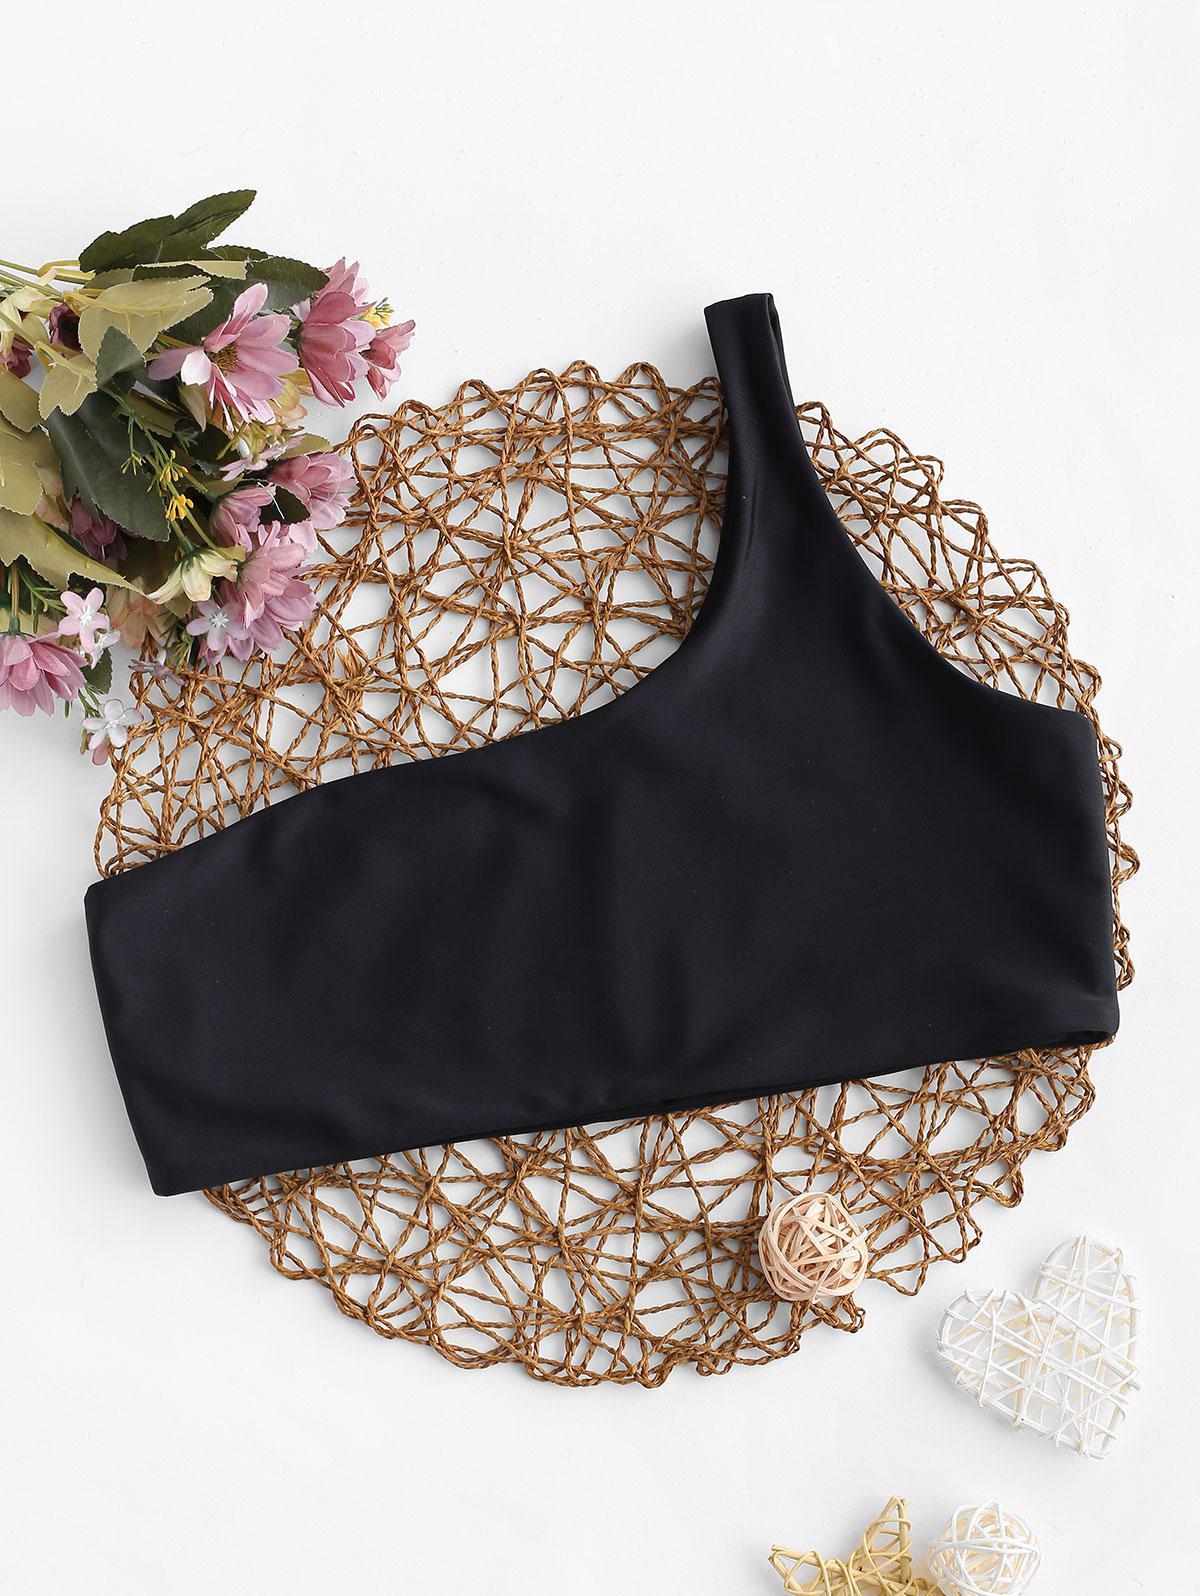 Zaful coupon: ZAFUL Solid No-padding One Shoulder Bikini Top